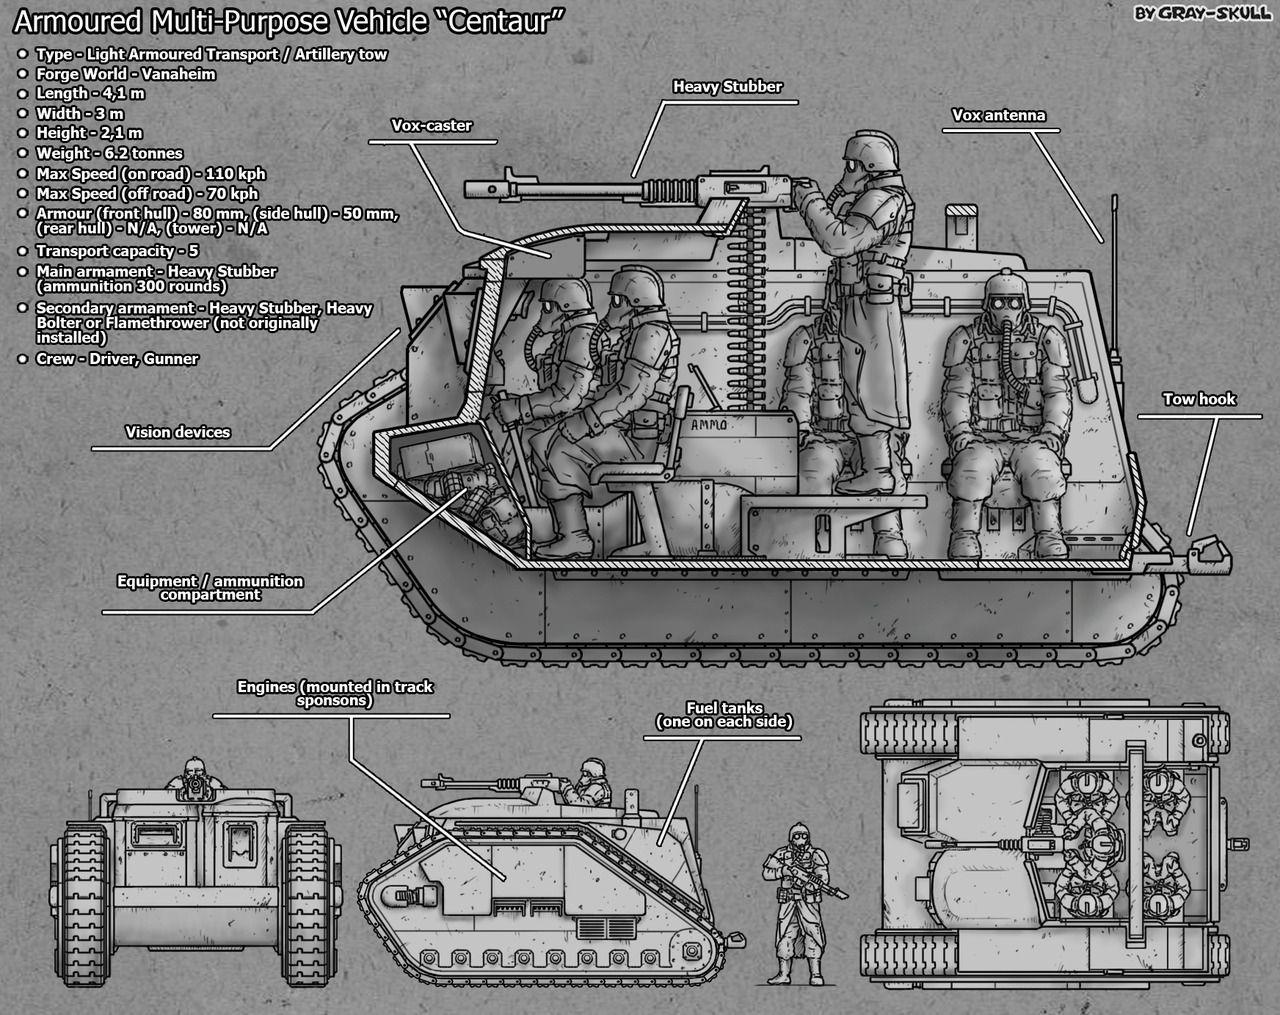 Vertical Slice Of Centaur An Armored Multi Purpose